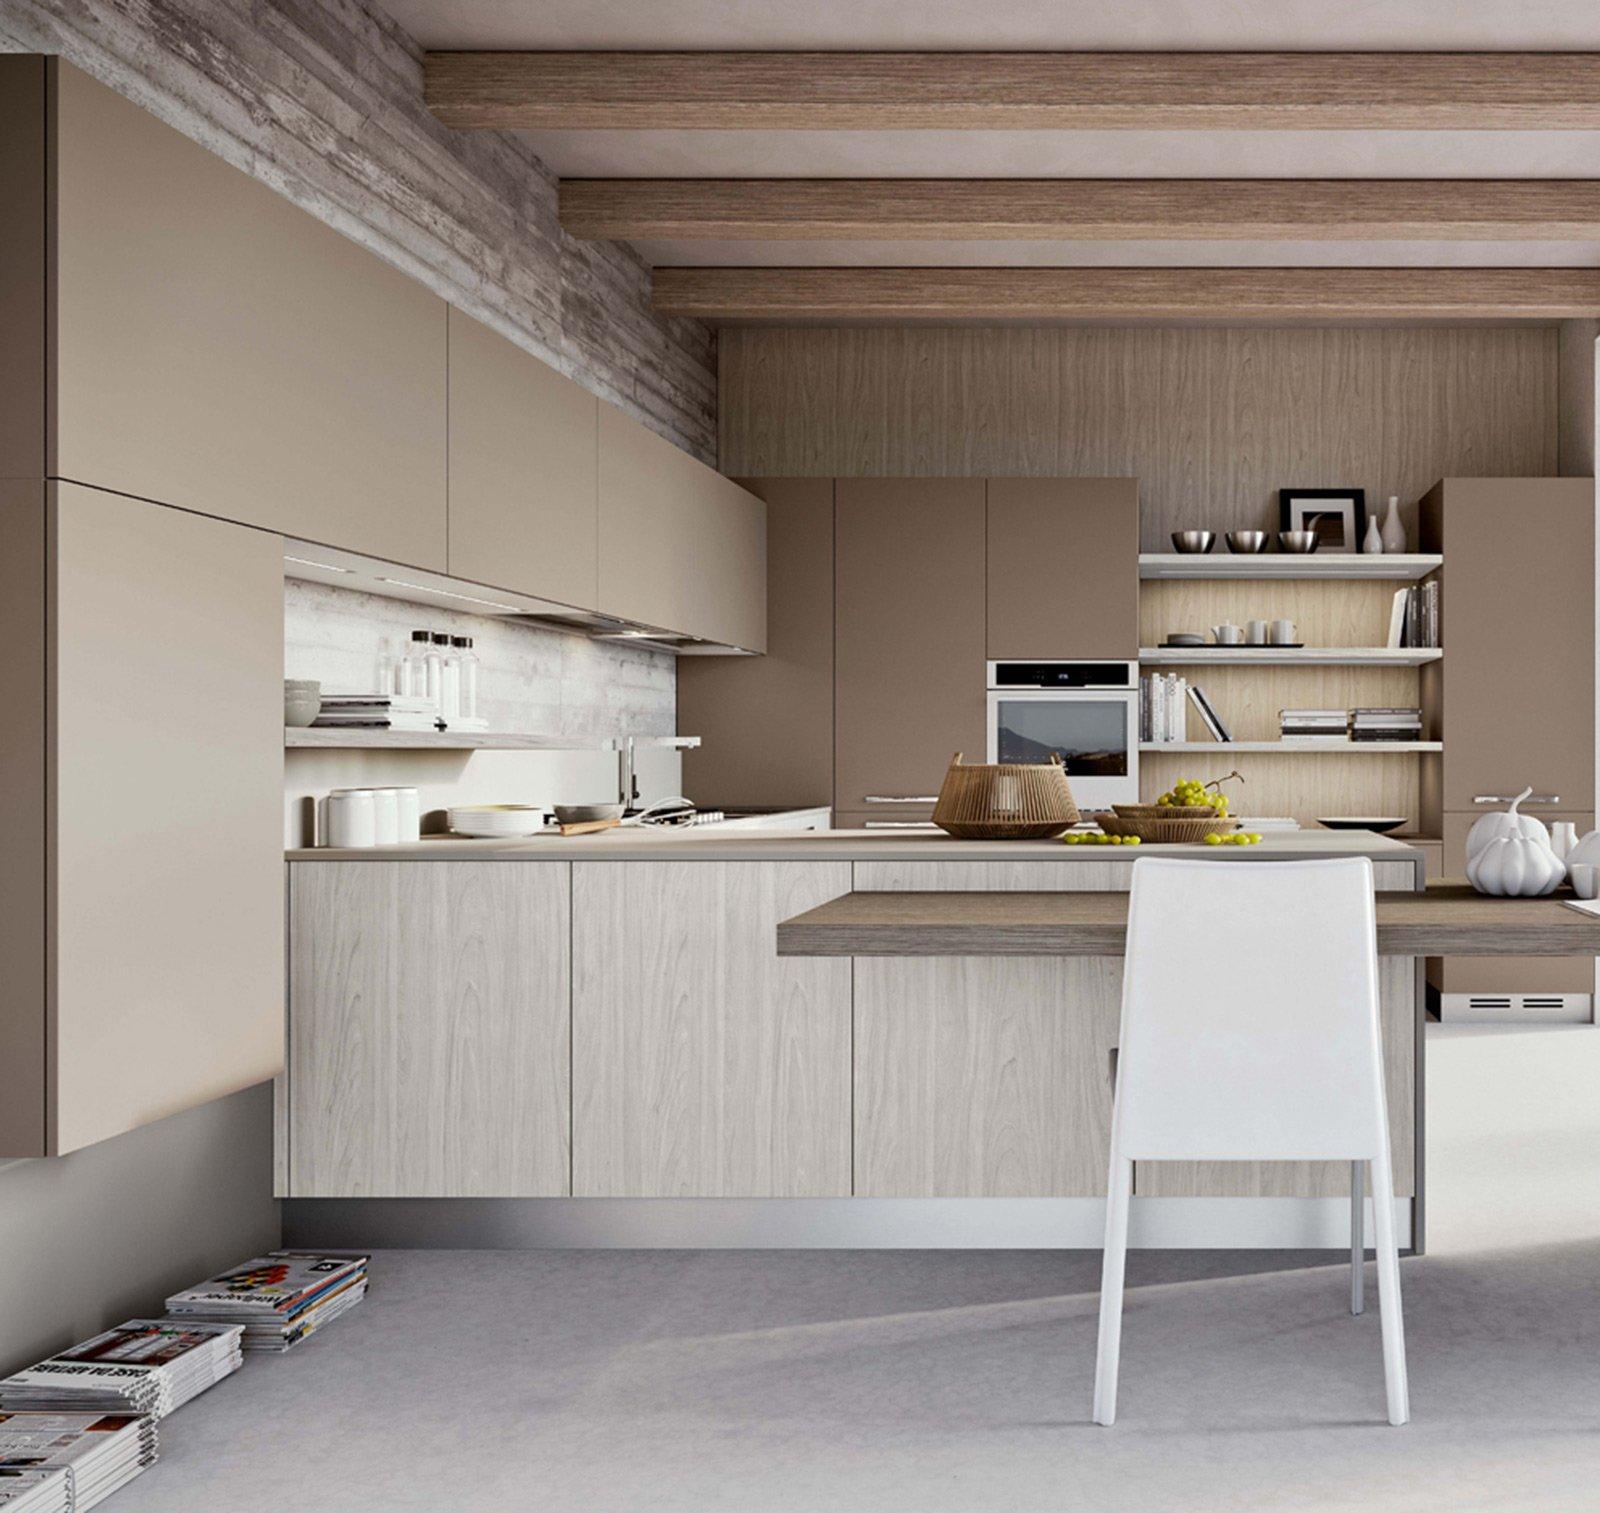 Cucina tante soluzioni per illuminarla cose di casa - Mensole per cucine ...